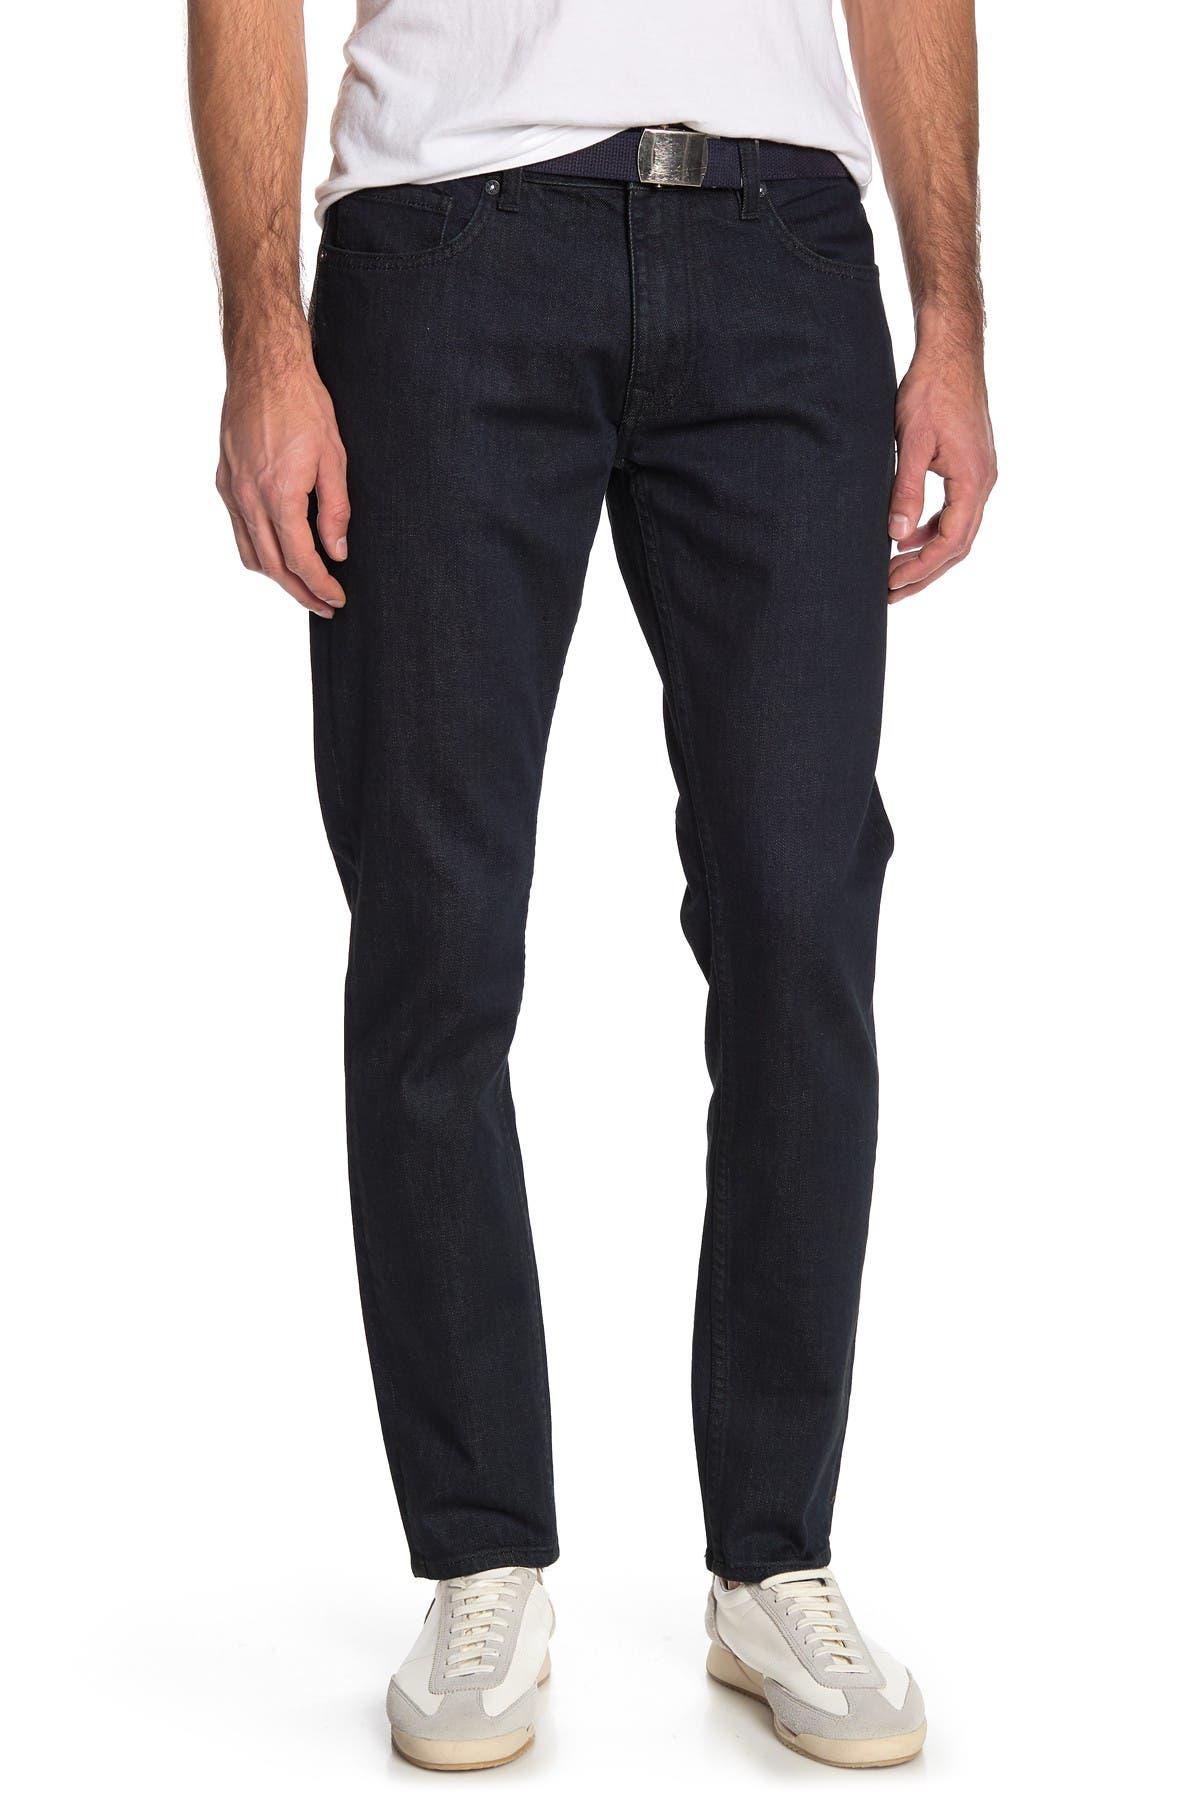 Image of Vigoss Mick Slim Jeans